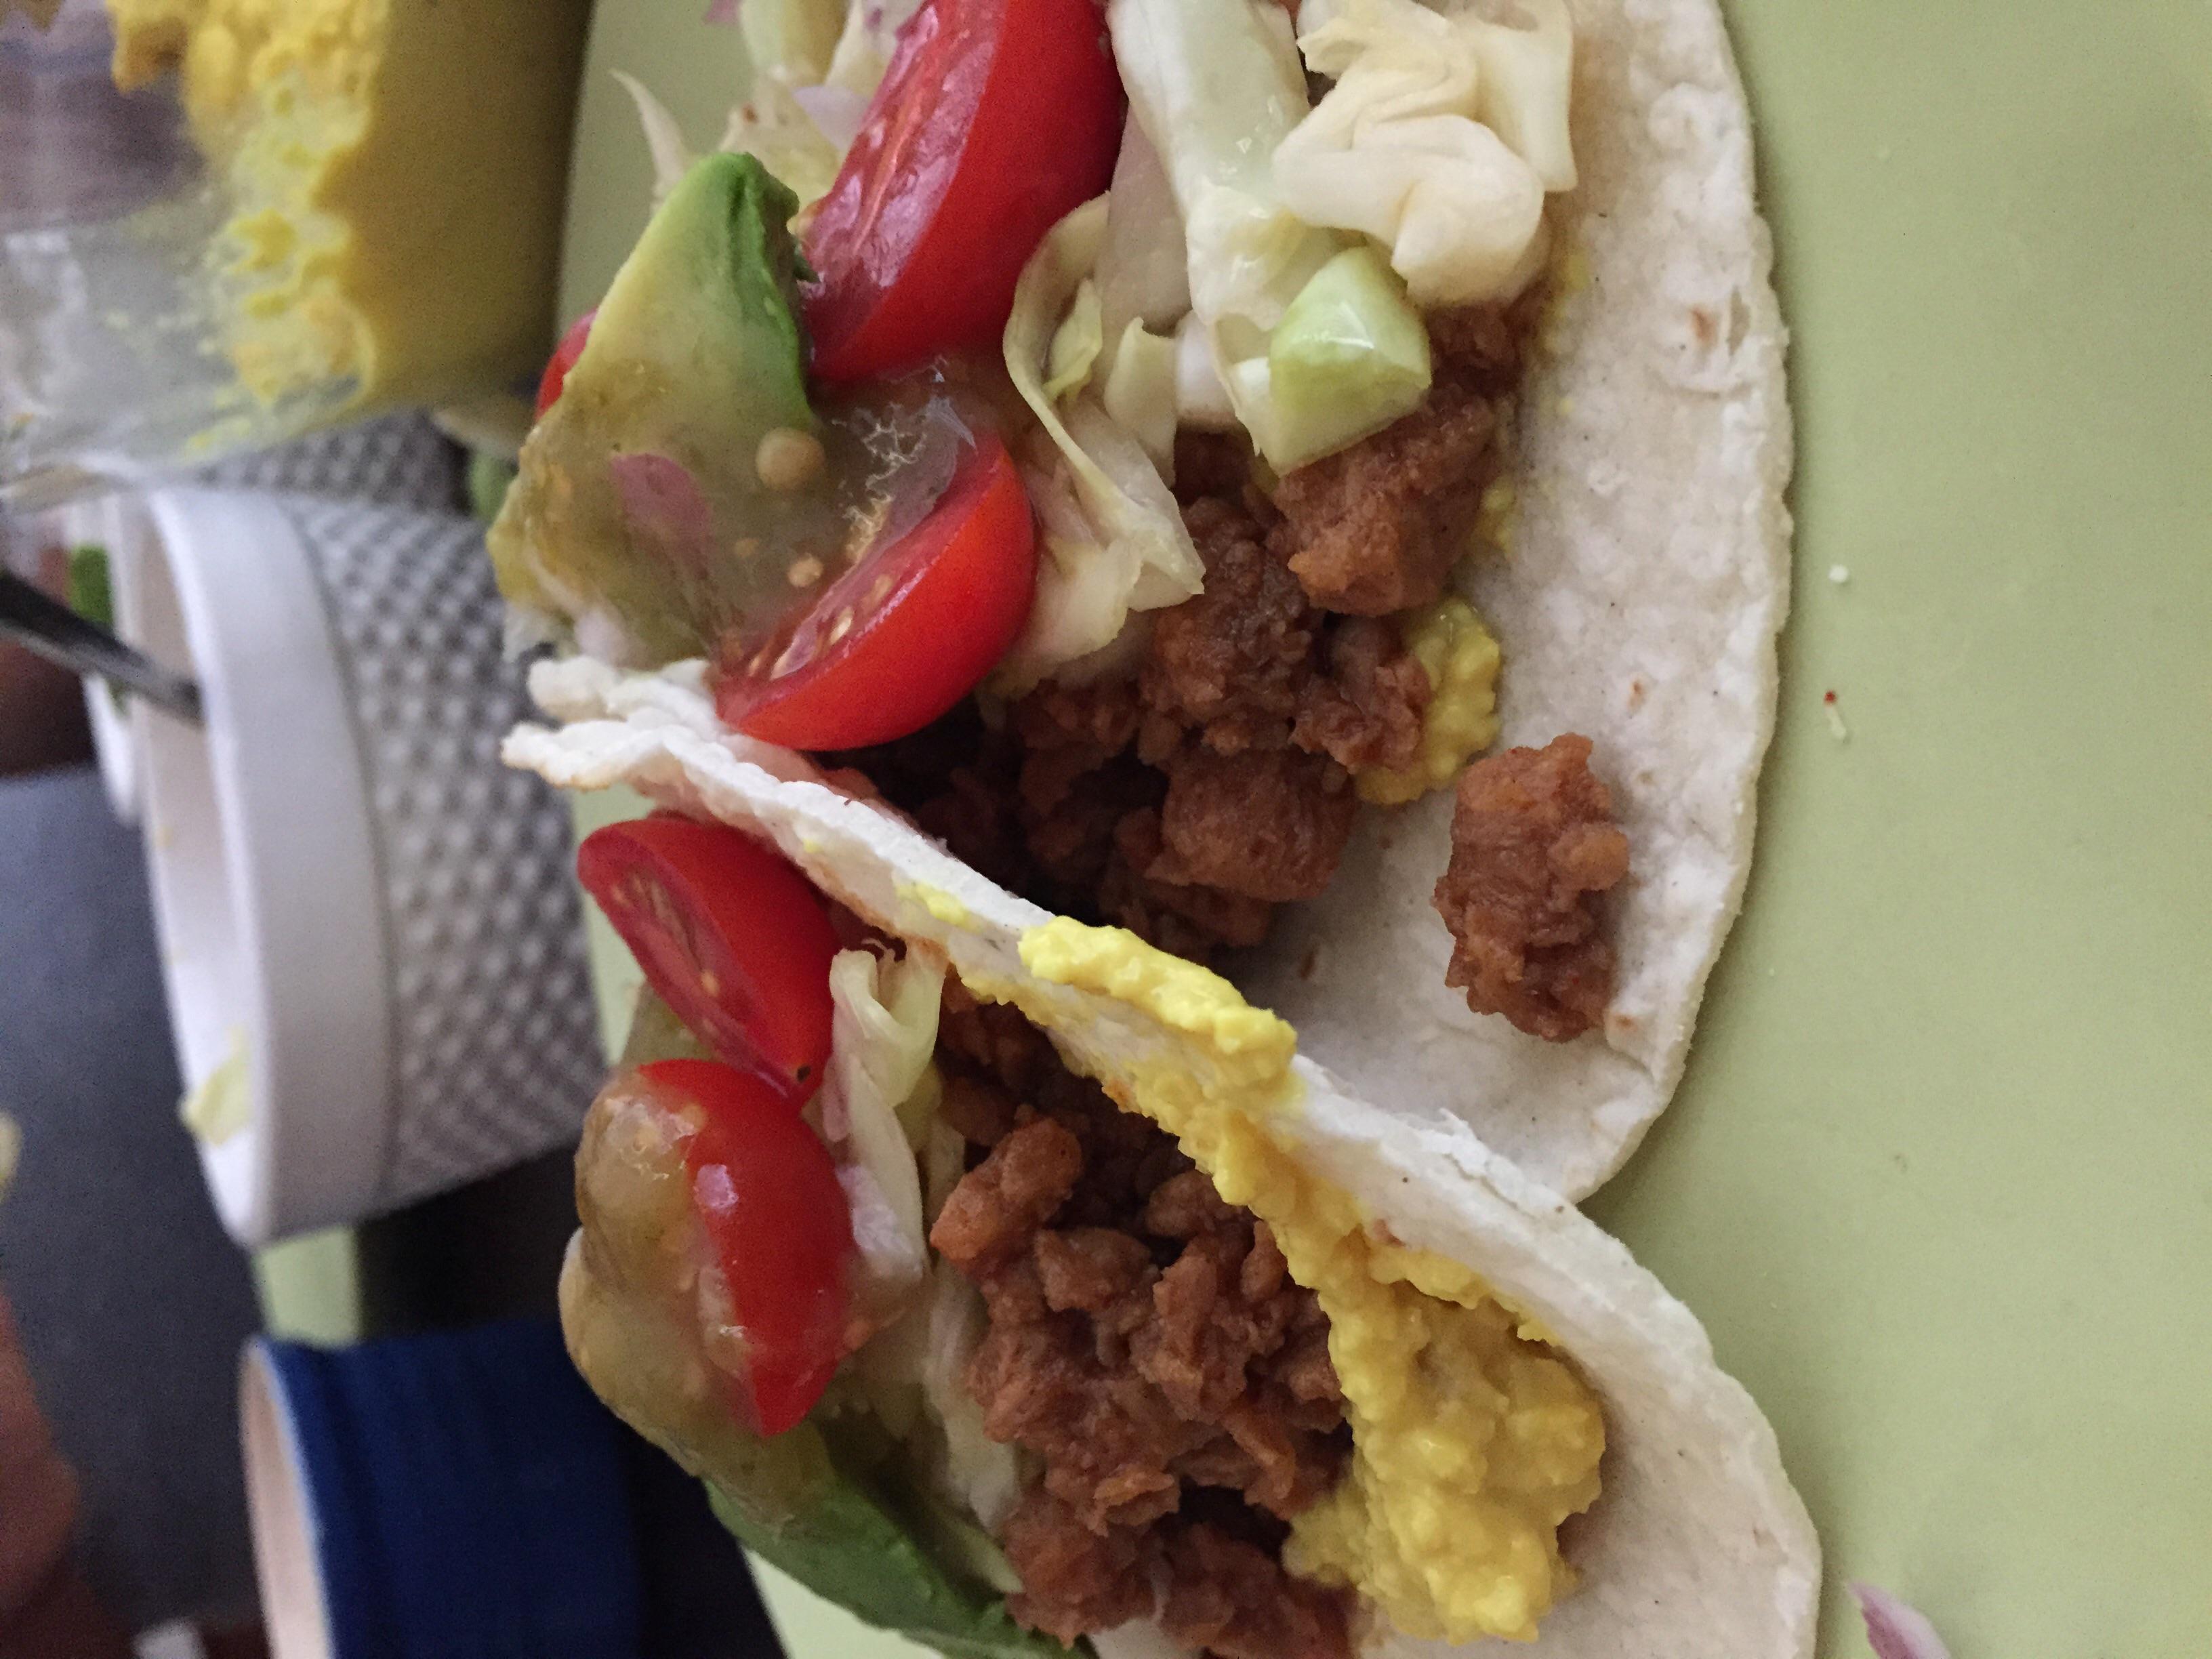 Best. Tacos. Ever.